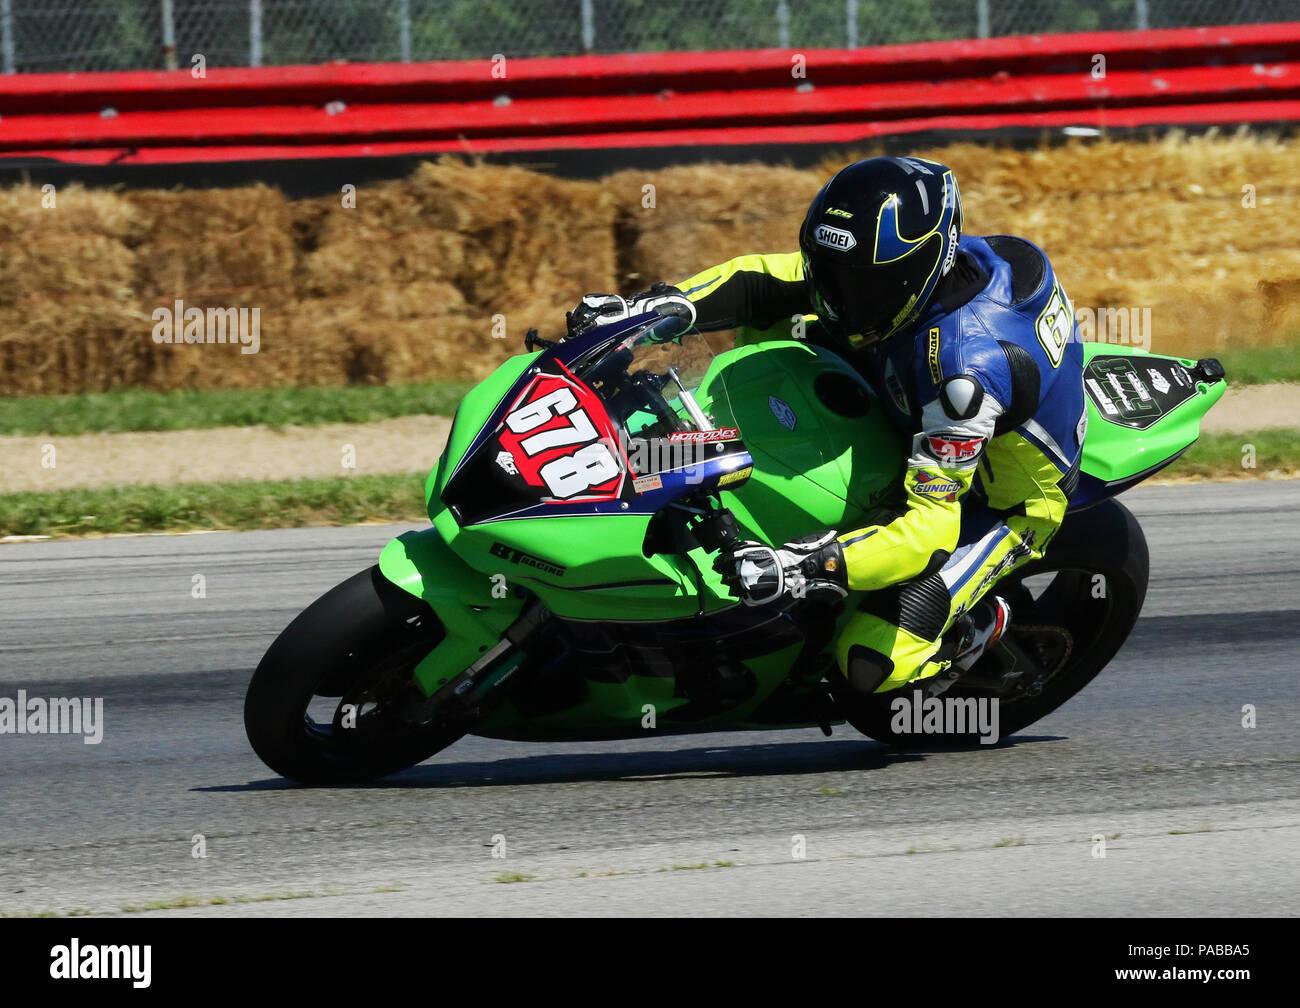 Racing Scooter Stock Photos & Racing Scooter Stock Images